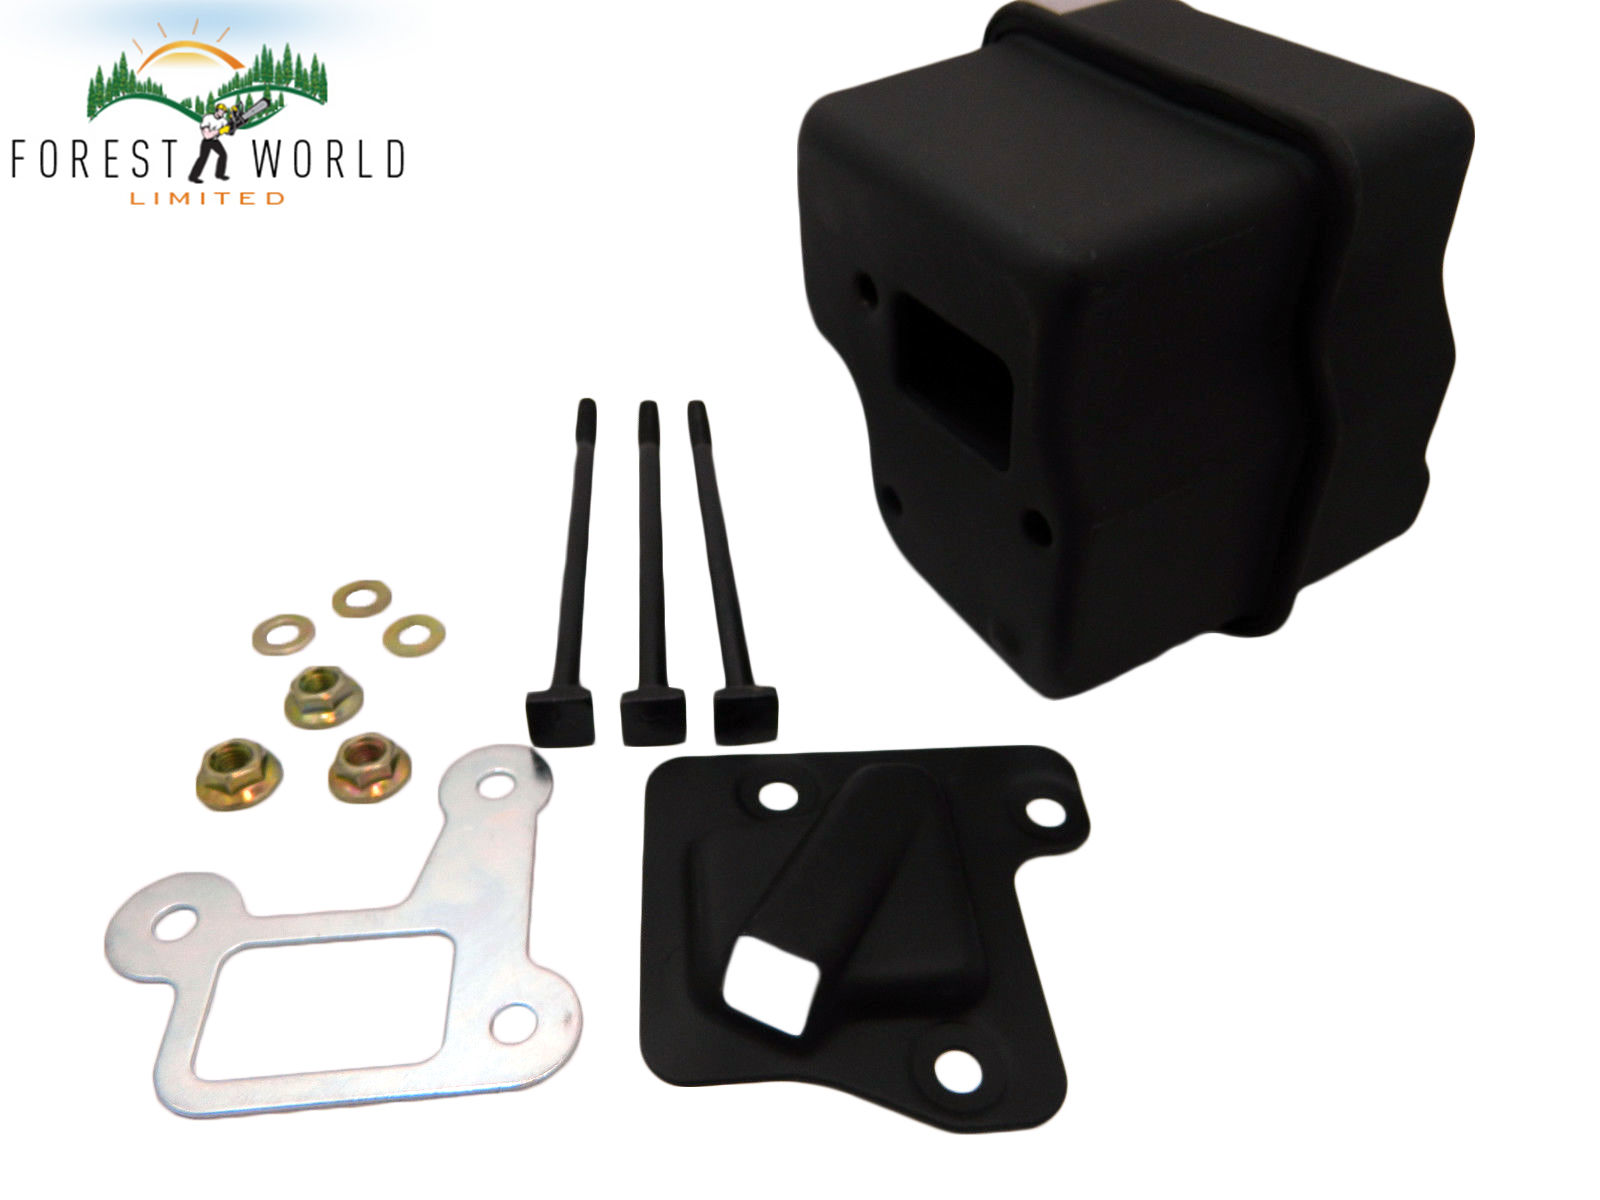 Stihl 029,039,MS290,MS390 chainsaw muffler kit,gasket,cover